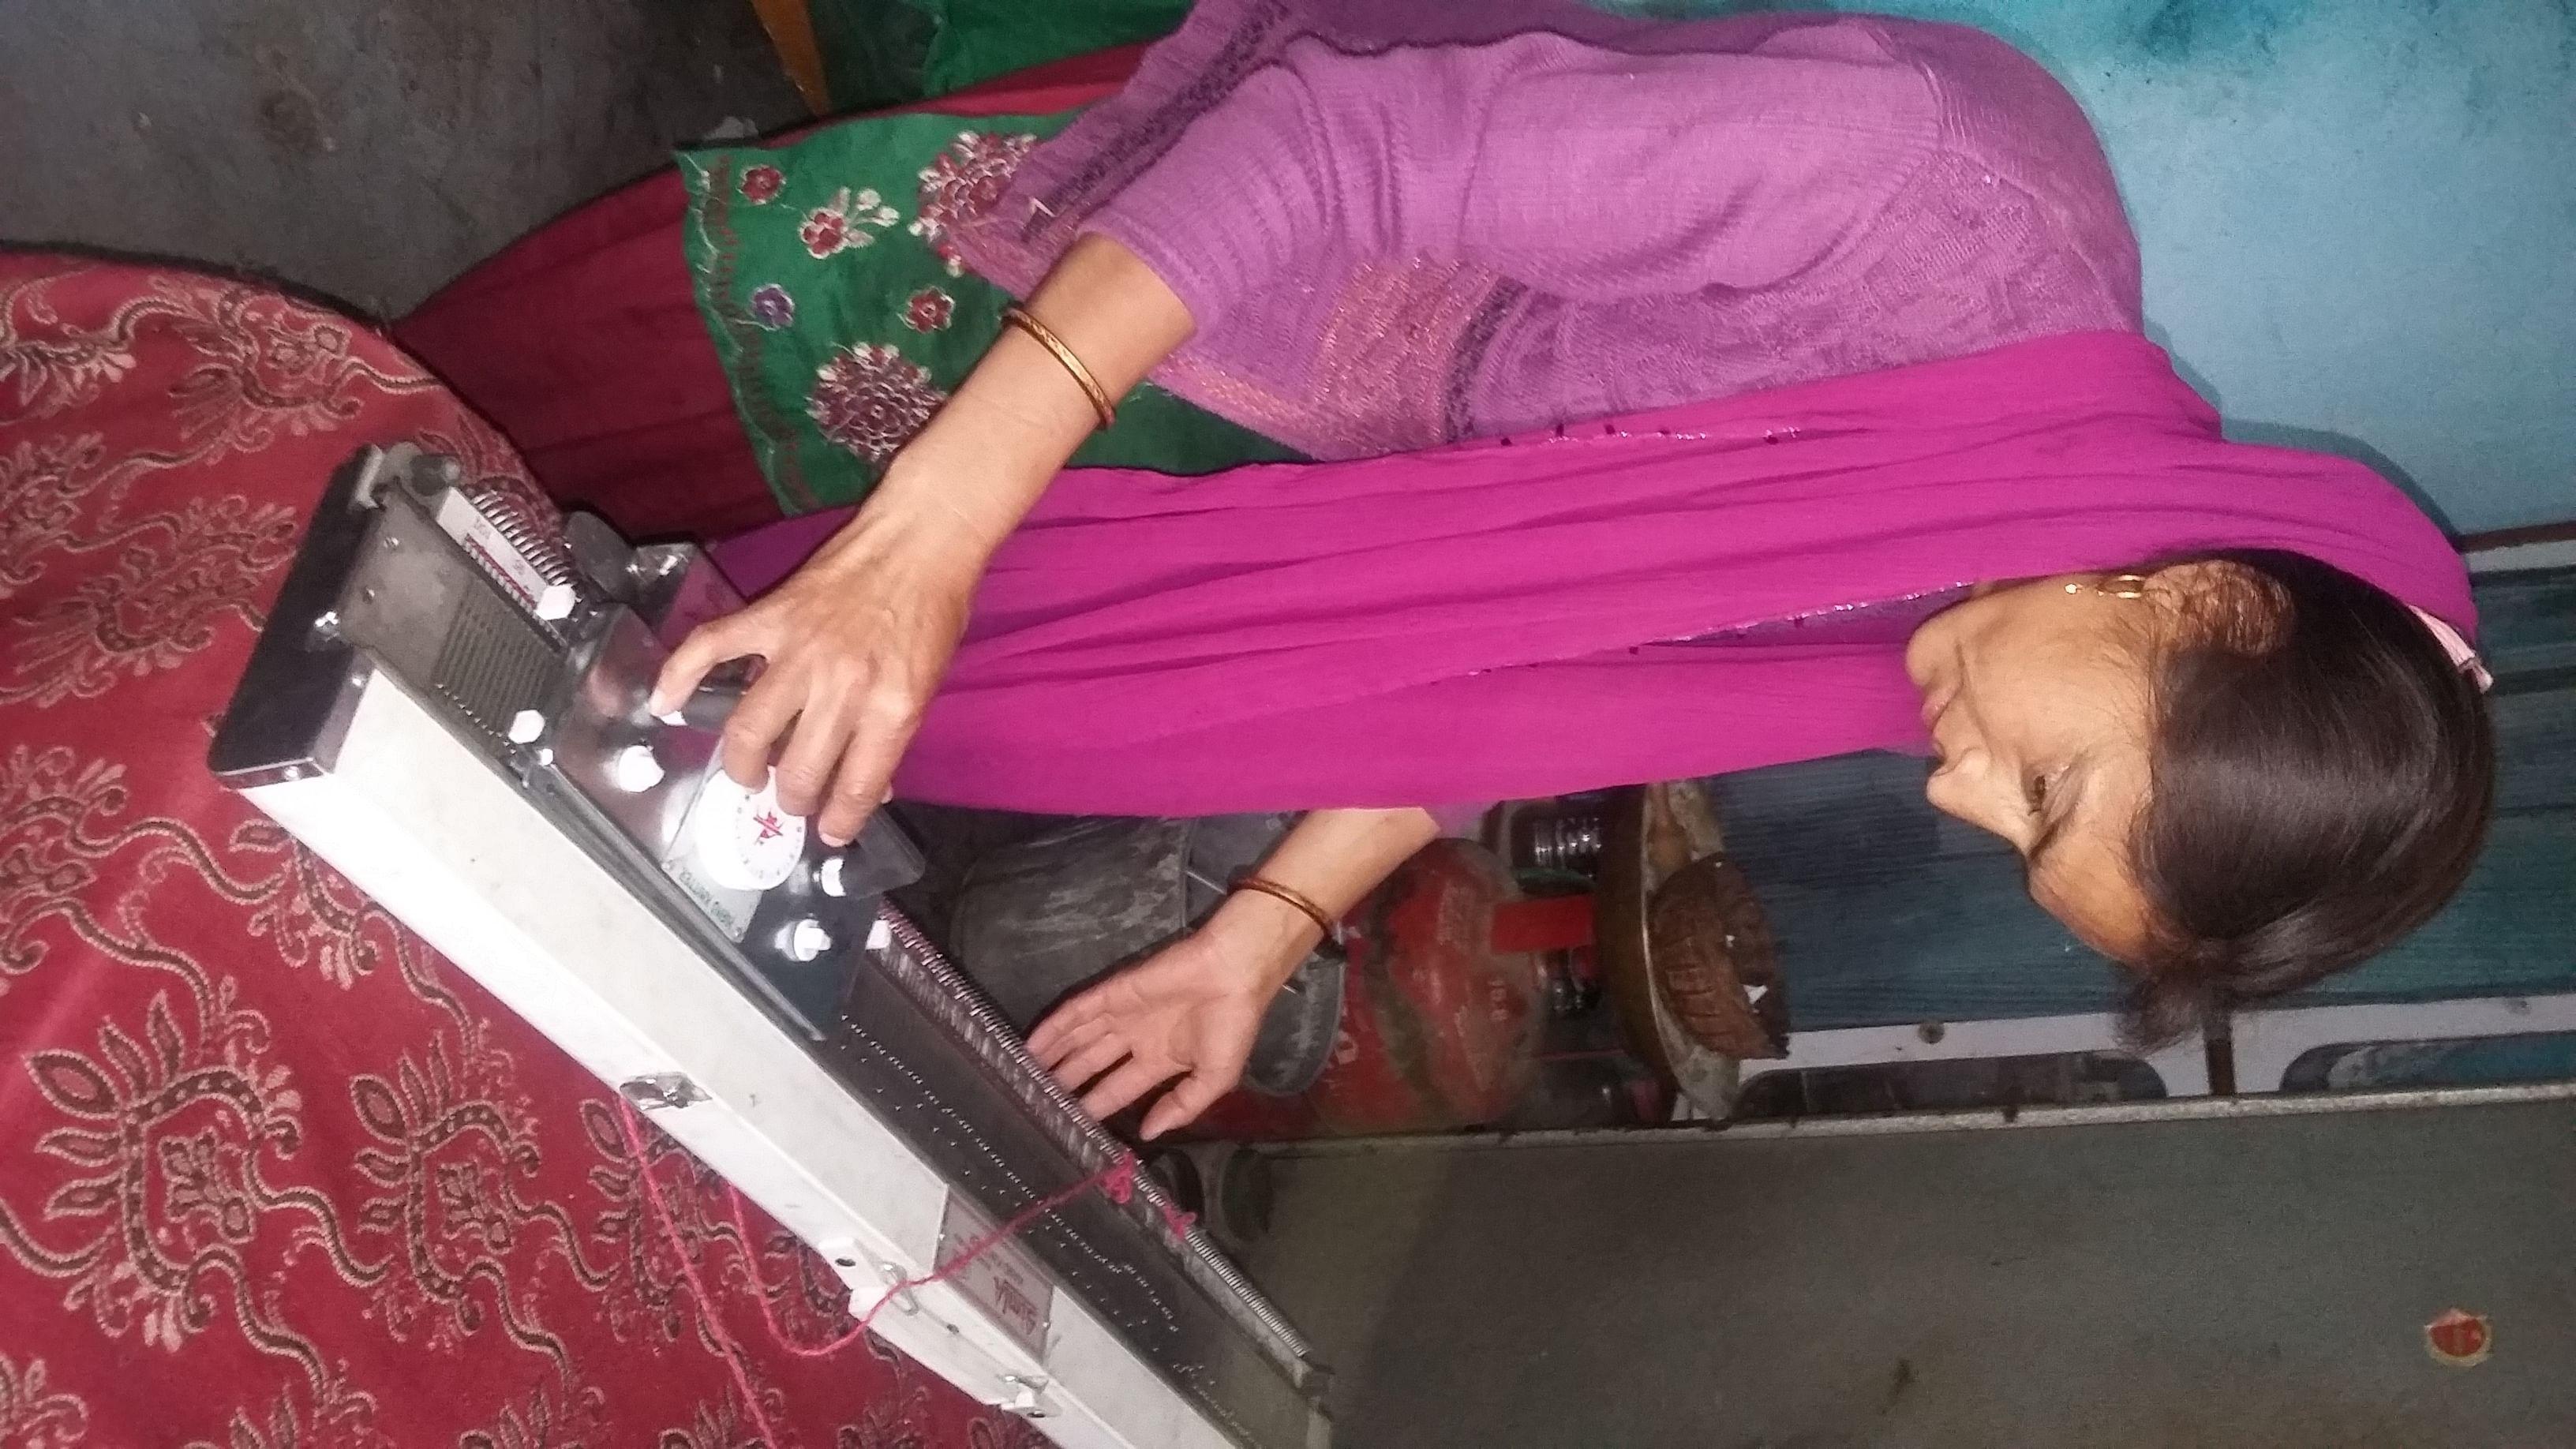 Gita Bisht, 33, of Chandrapuri, widowed in 2013, sees her knitting machine as the means to a better life someday. (Credit: Nitin Jugran Bahuguna\WFS)